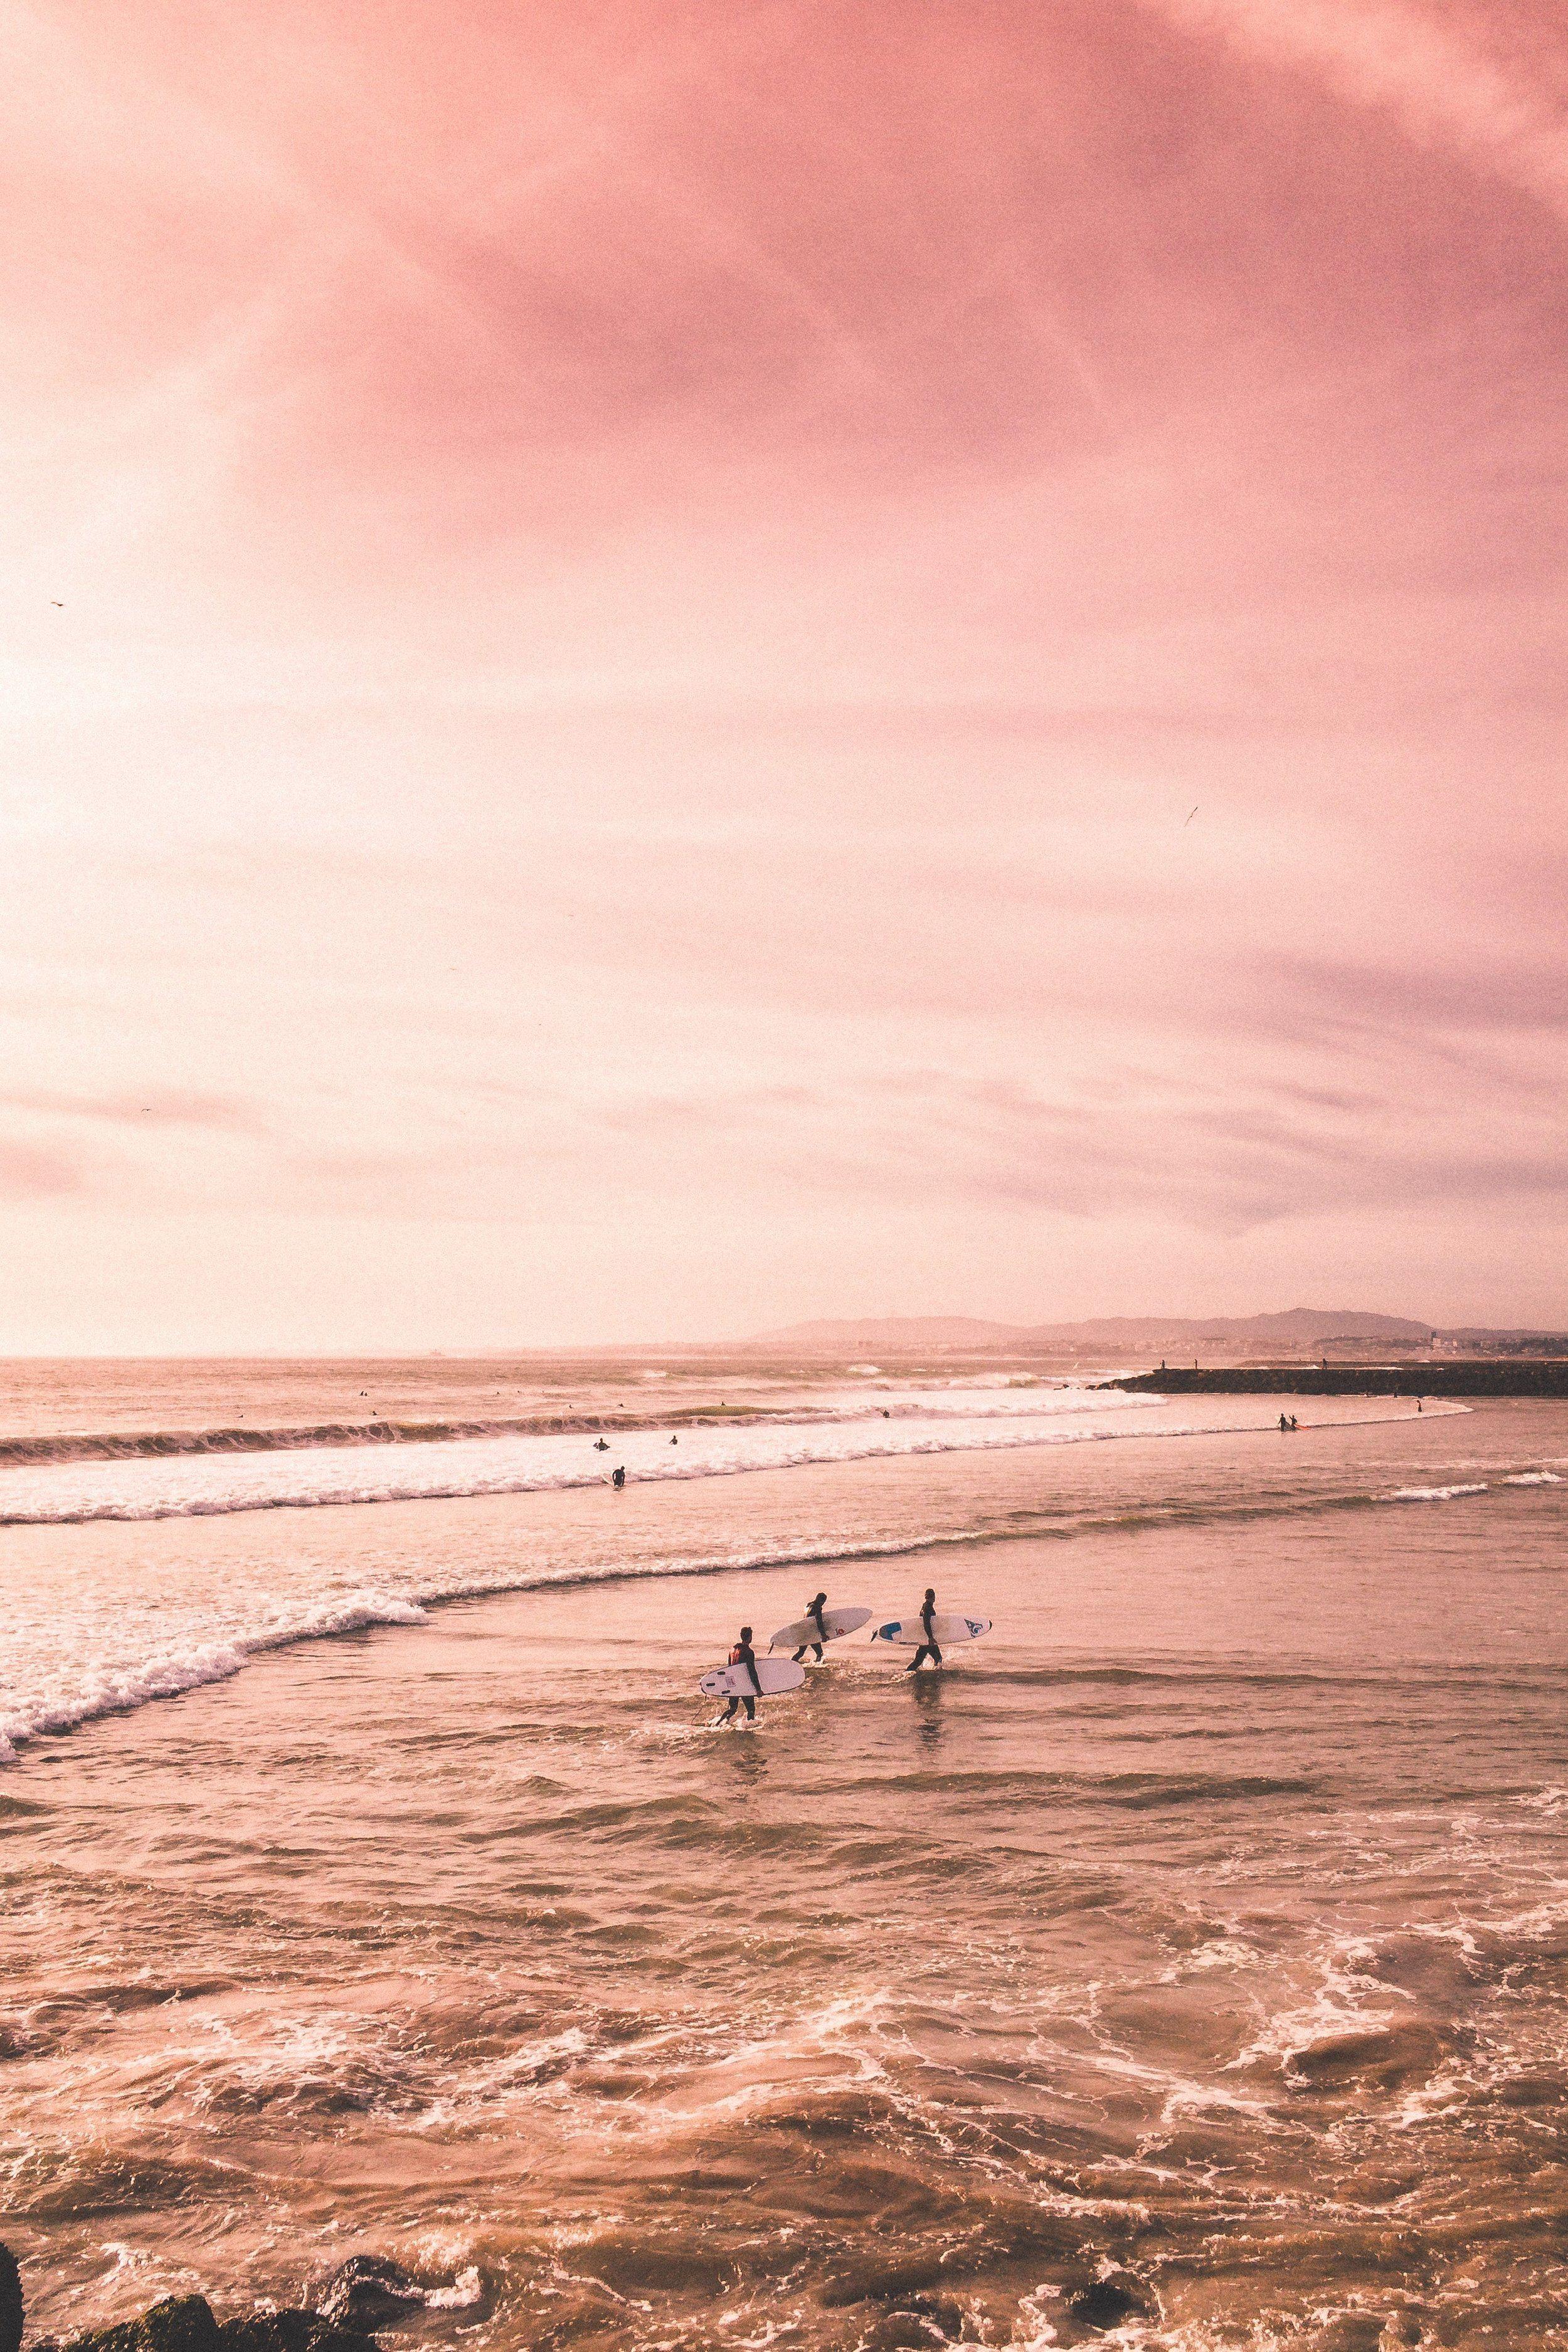 Pura Vida In Costa Rica Sarah Lampley Beach Pictures Beach Wallpaper Surfing